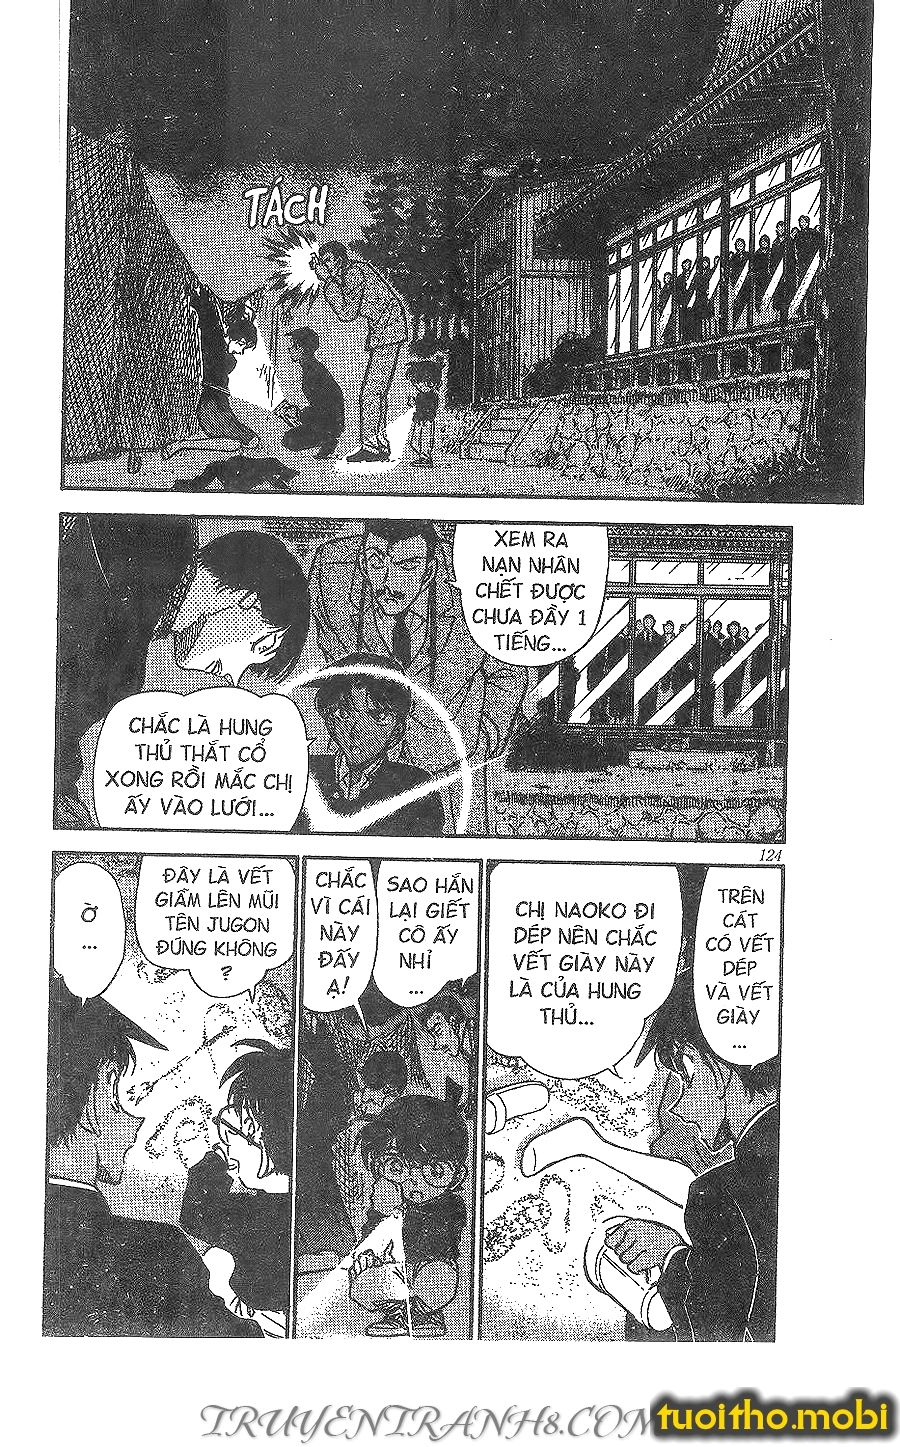 conan chương 281 trang 1